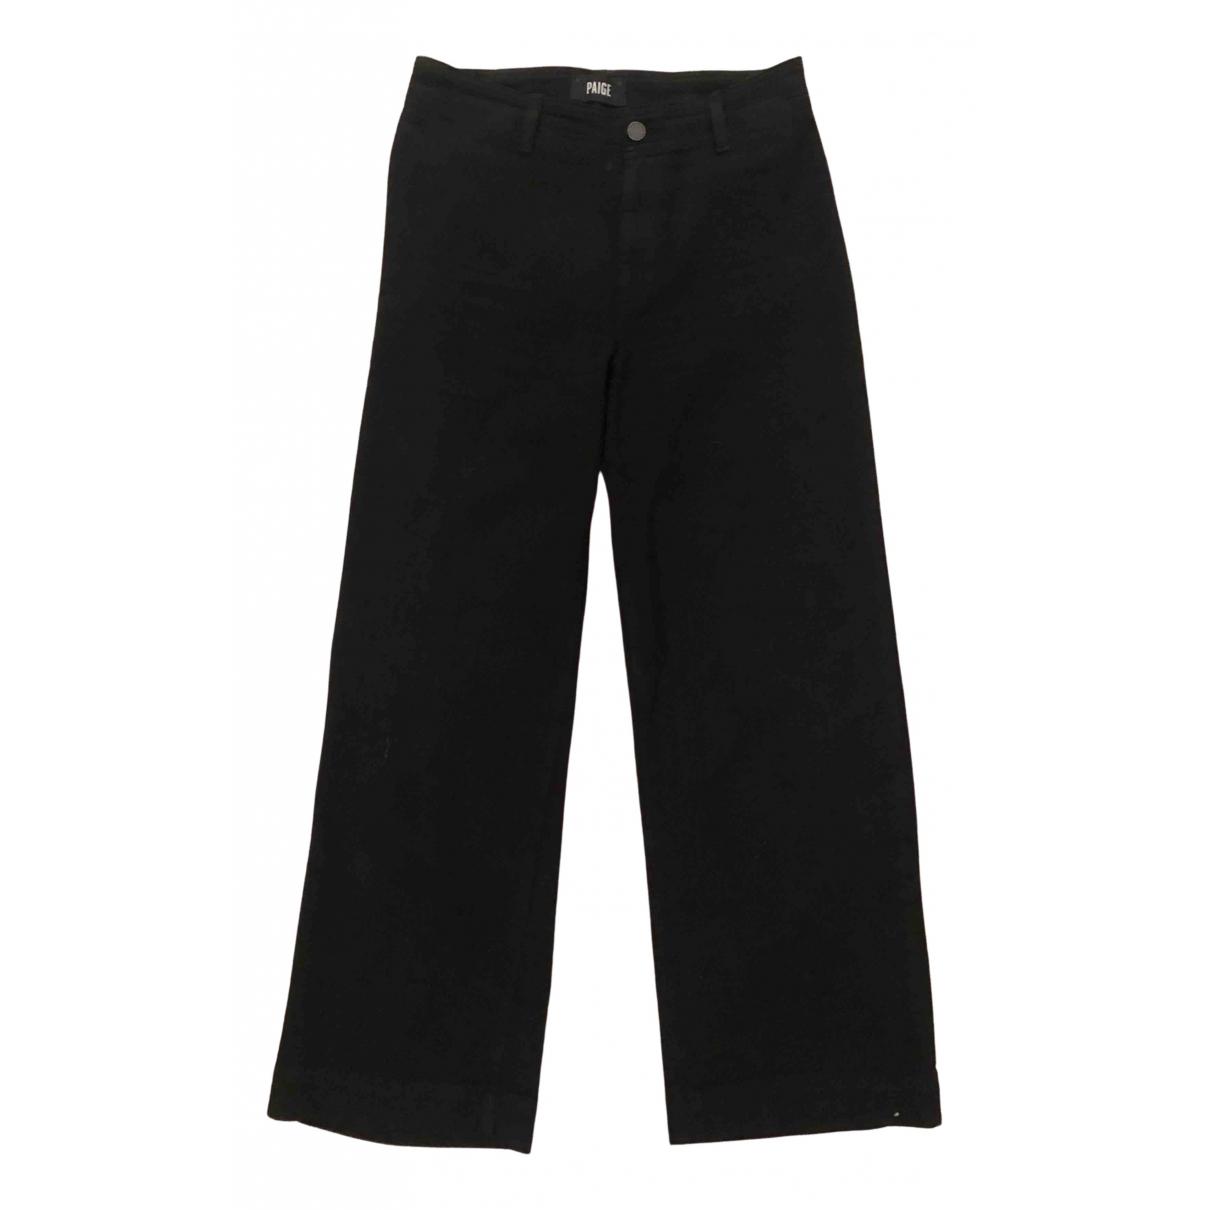 Paige Jeans N Black Cotton - elasthane Jeans for Women 28 US